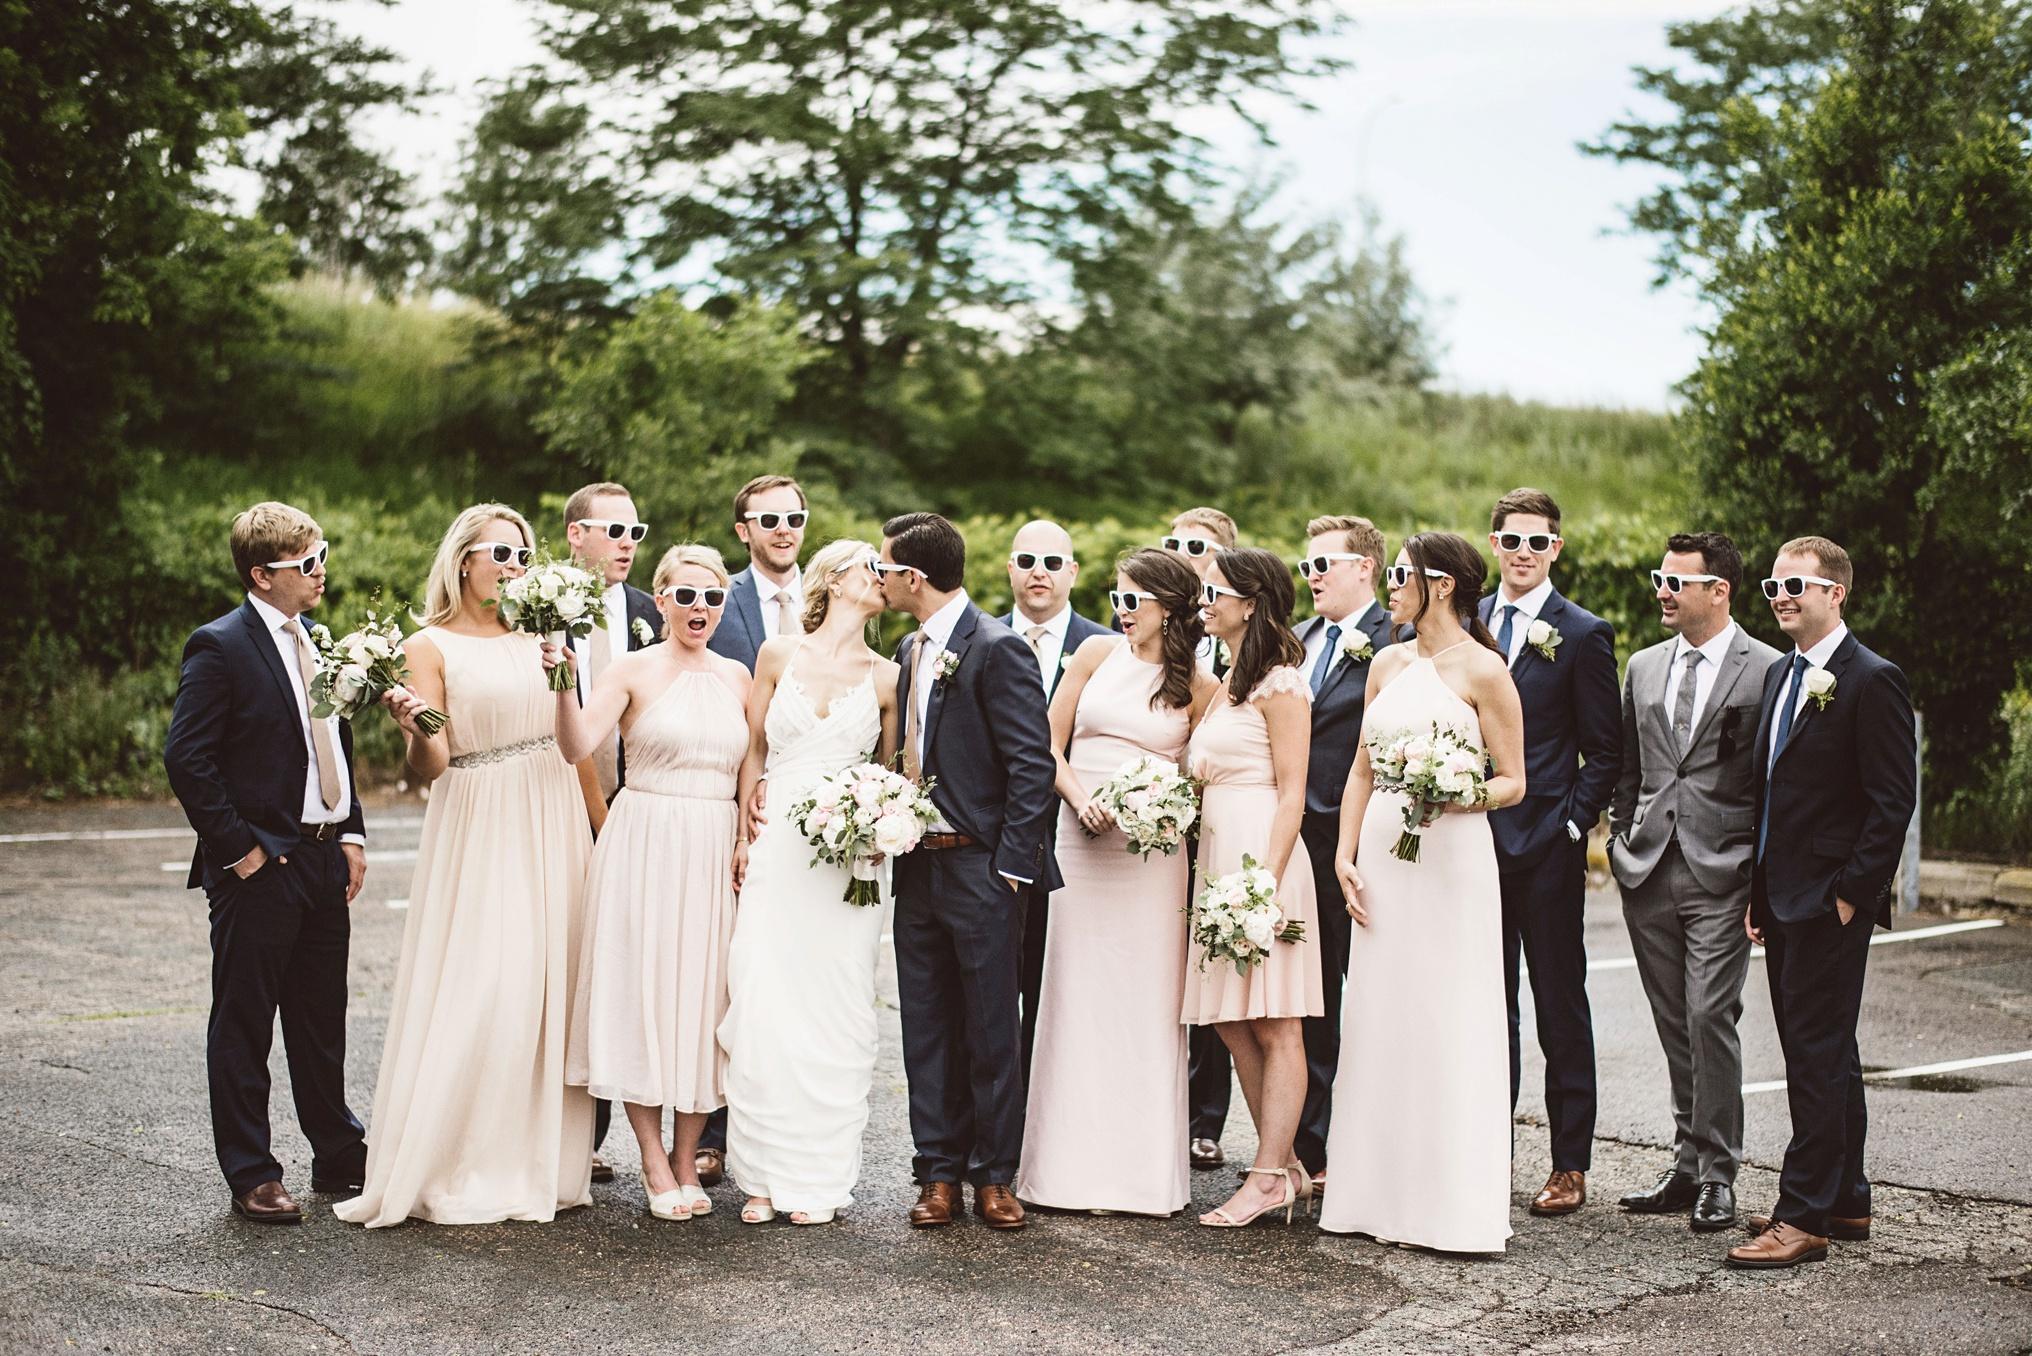 best_wedding_photography_2017_by_lucas_botz_photography_182.jpg